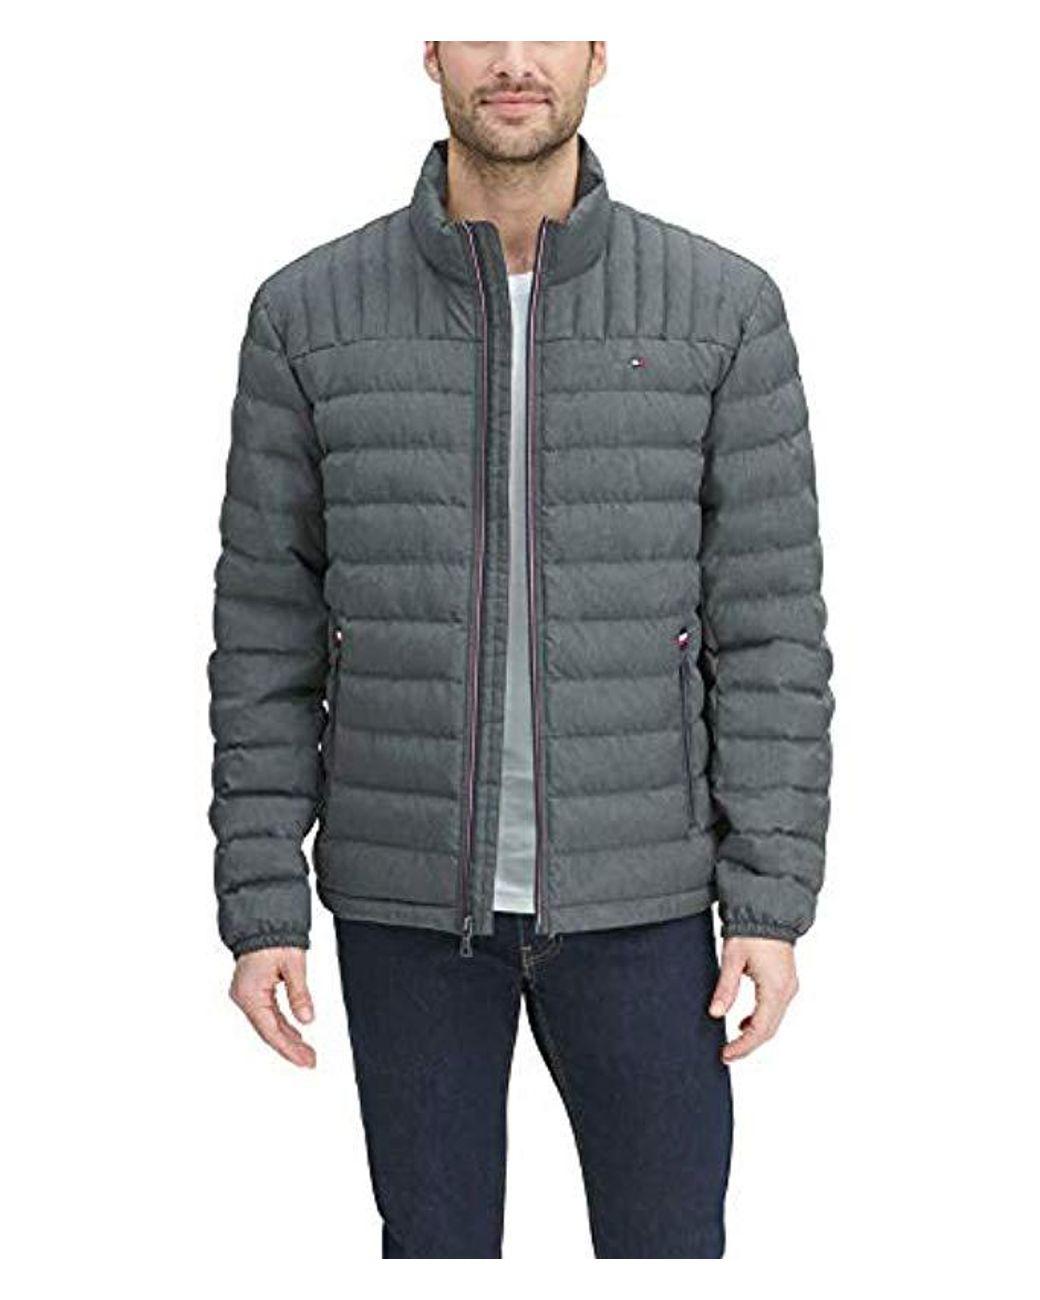 930d268c5 Men's Gray Ultra Loft Packable Puffer Jacket Down Down Alternative Coat